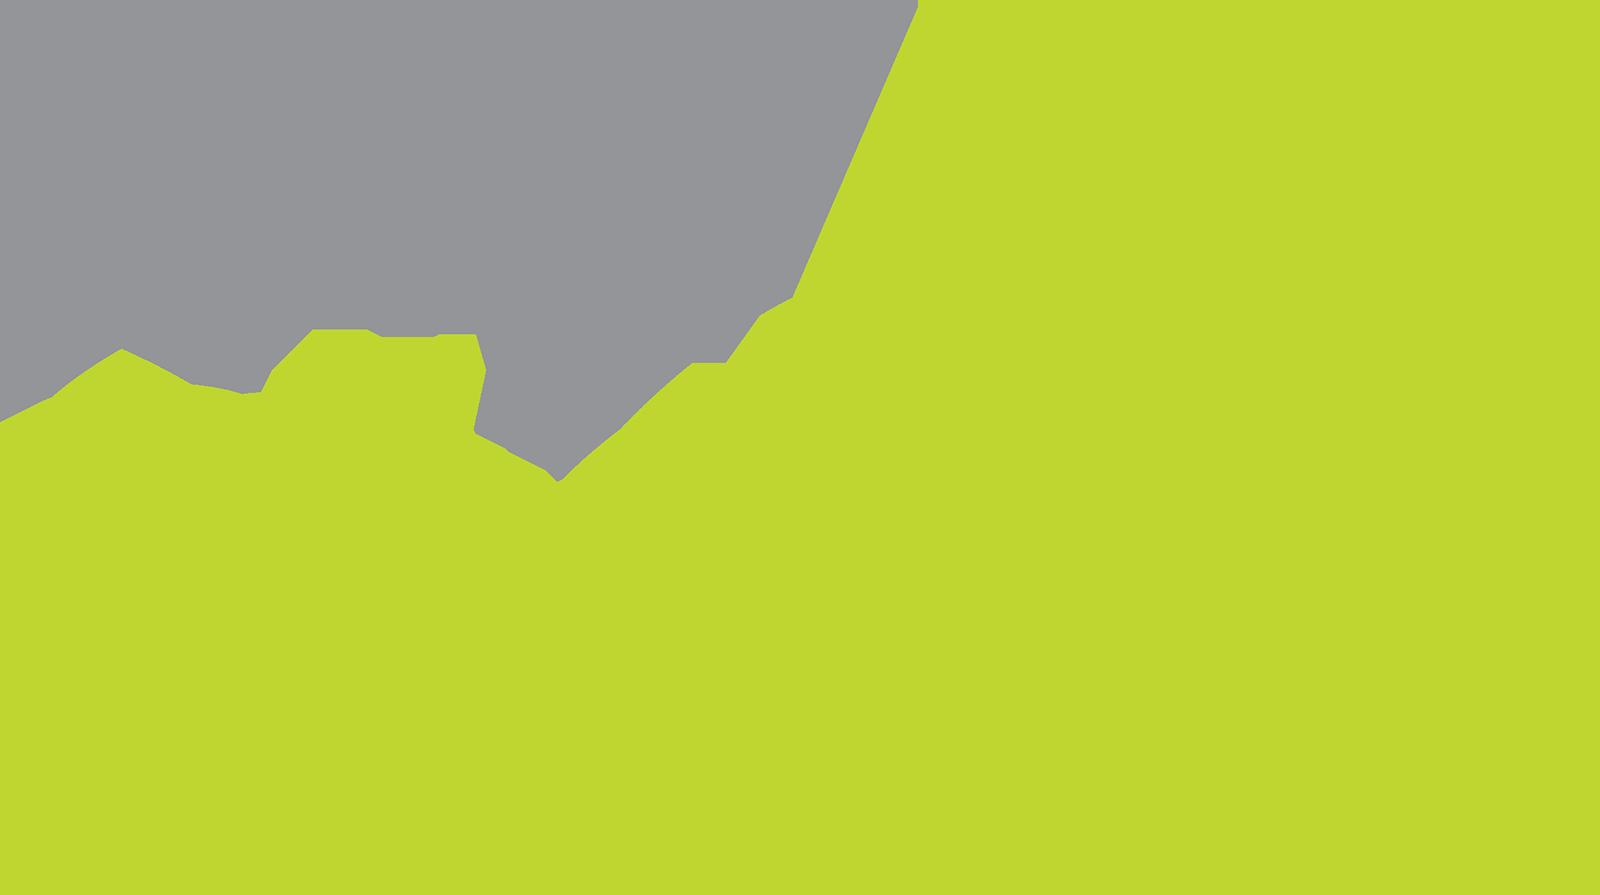 Novo(a) logo/logotipo/marca da MyStore